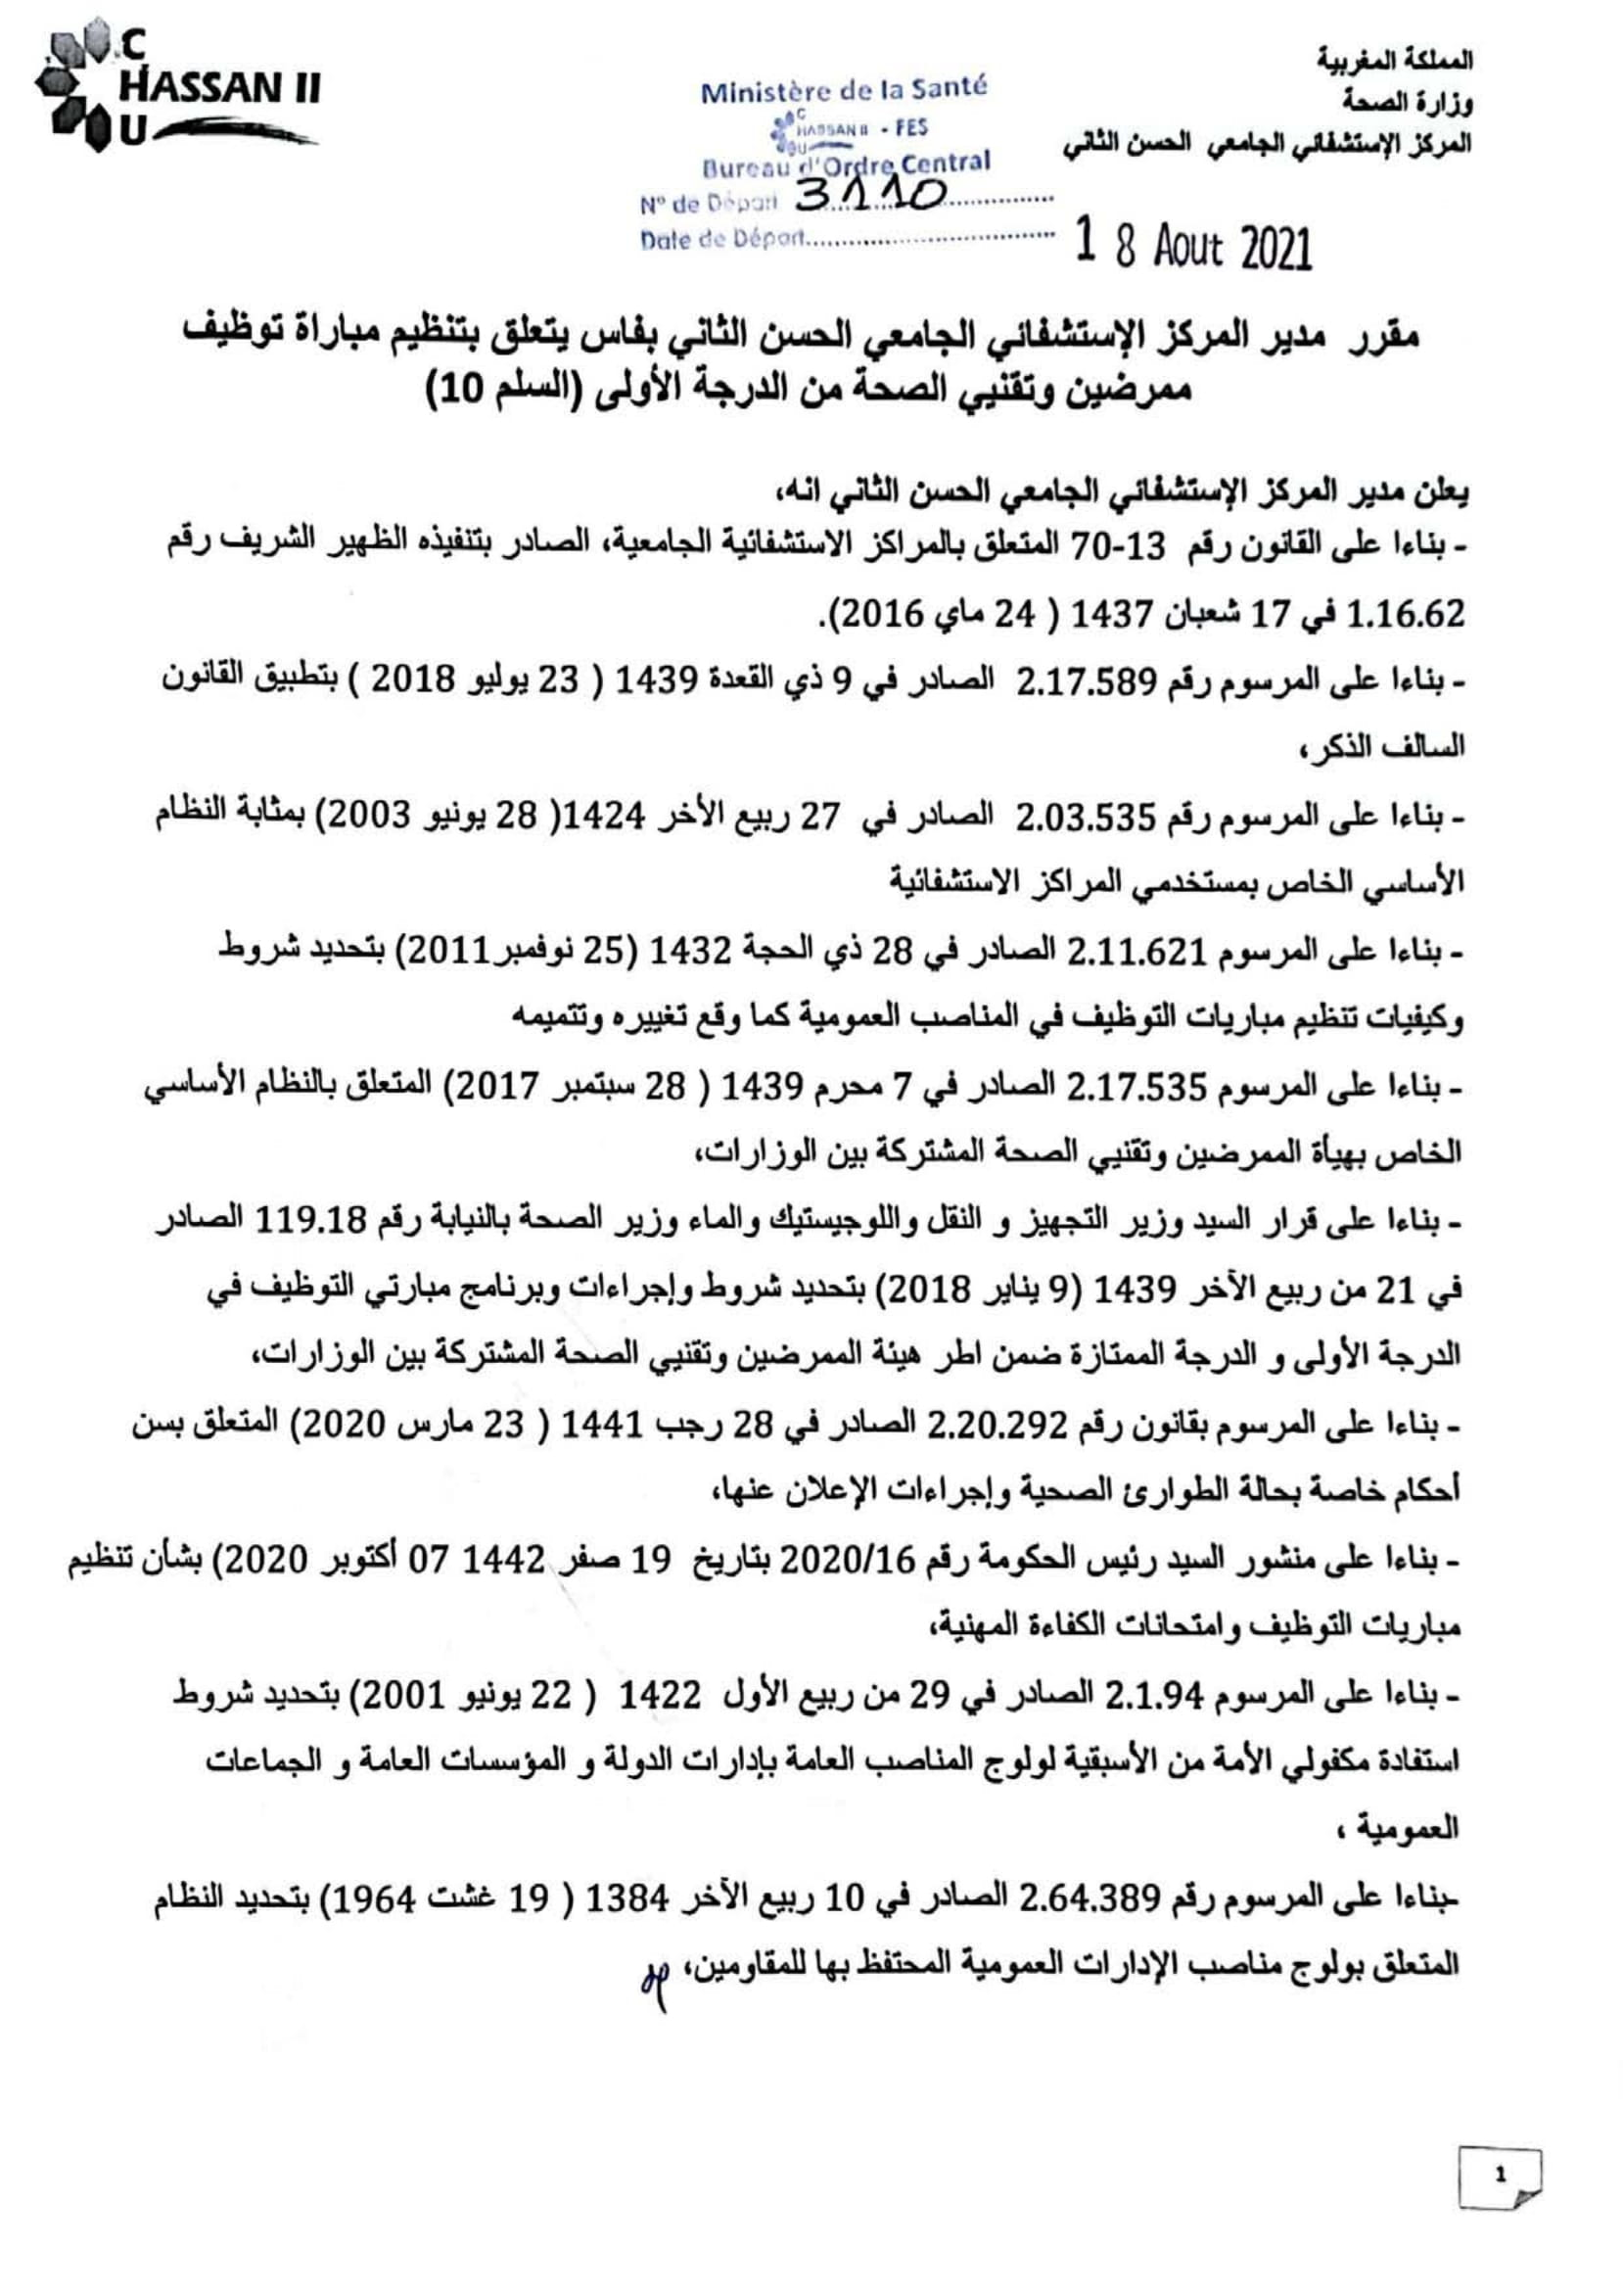 DRHFC0496 1 Concours de Recrutement CHU Hassan II 2021 (88 Postes)